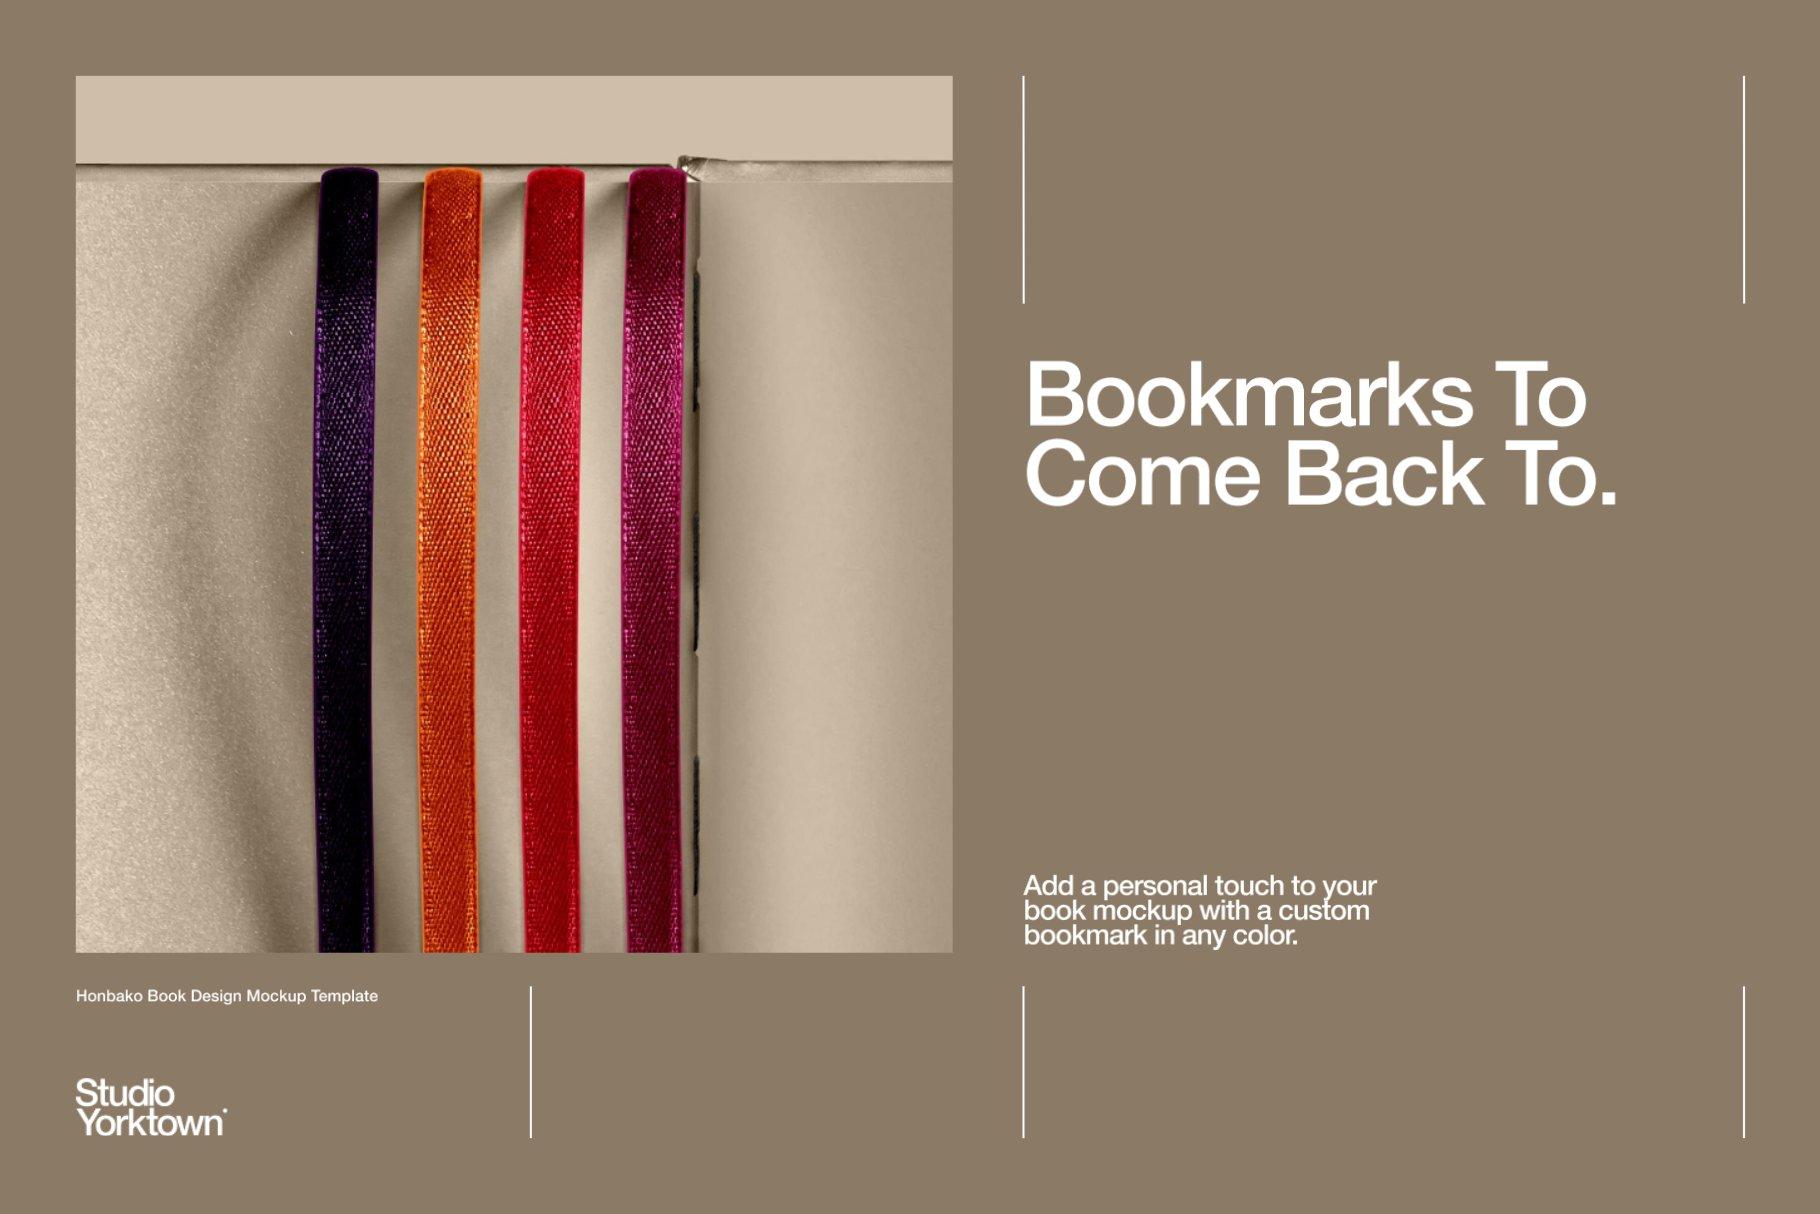 Honbako 逼真全息箔页面卷曲书籍设计PSD样机模板(4329)插图(5)